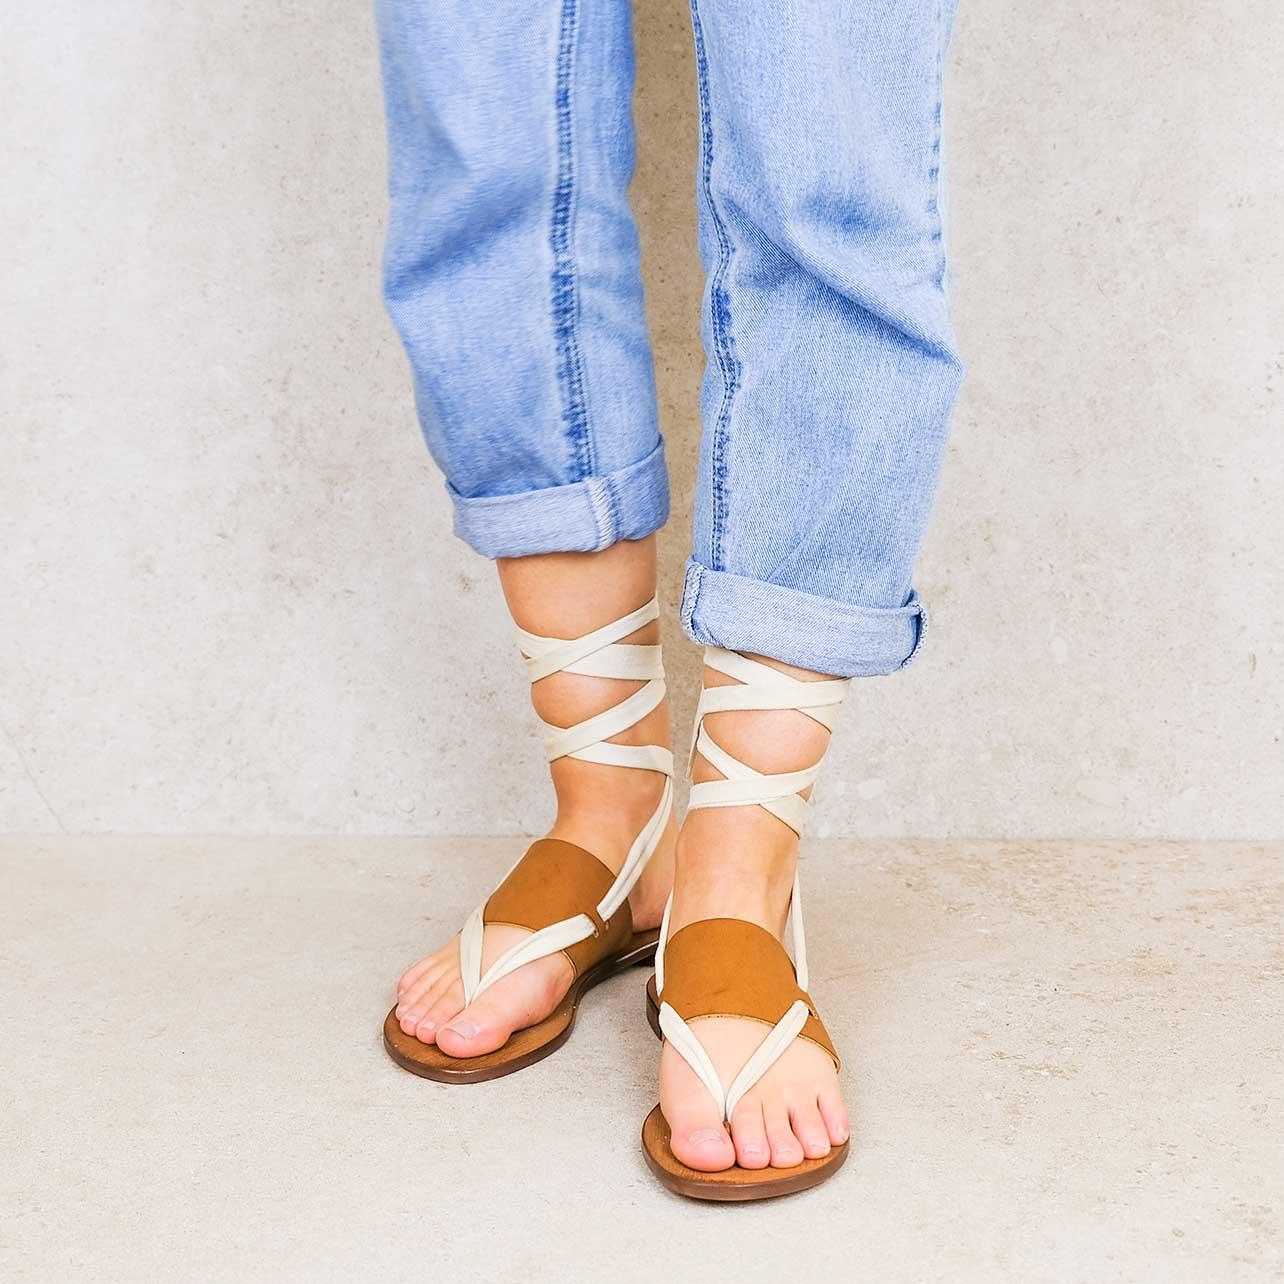 Ivory-suede ribbons linten lintsandalen sandals travelsandals vegan sustainable sandals wikkelsandalen